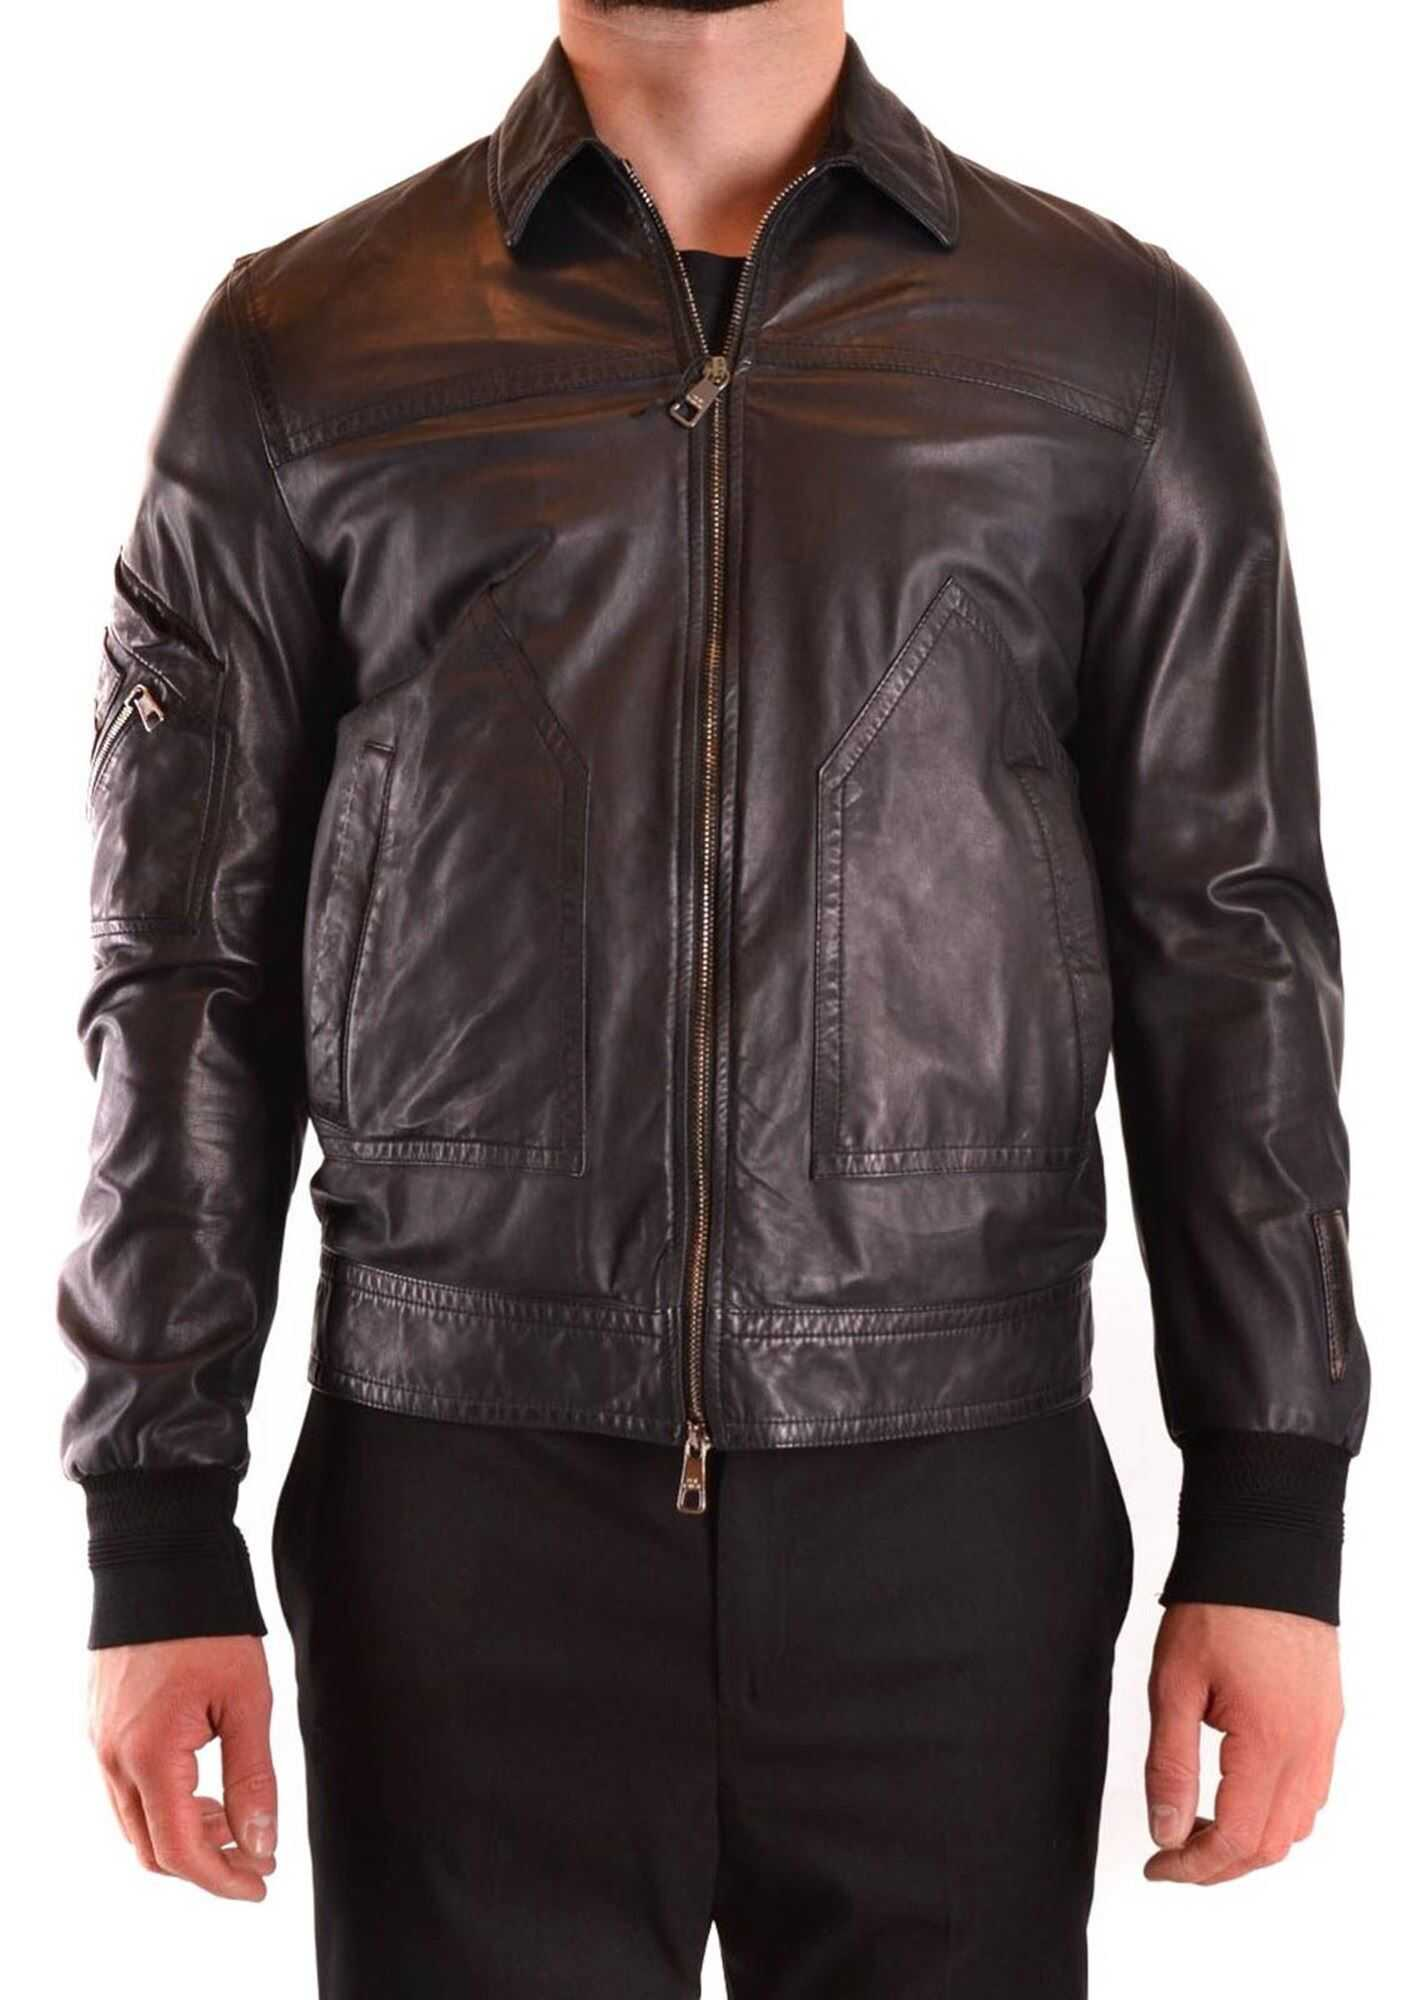 Neil Barrett Zipped Leather Jacket In Black Black imagine